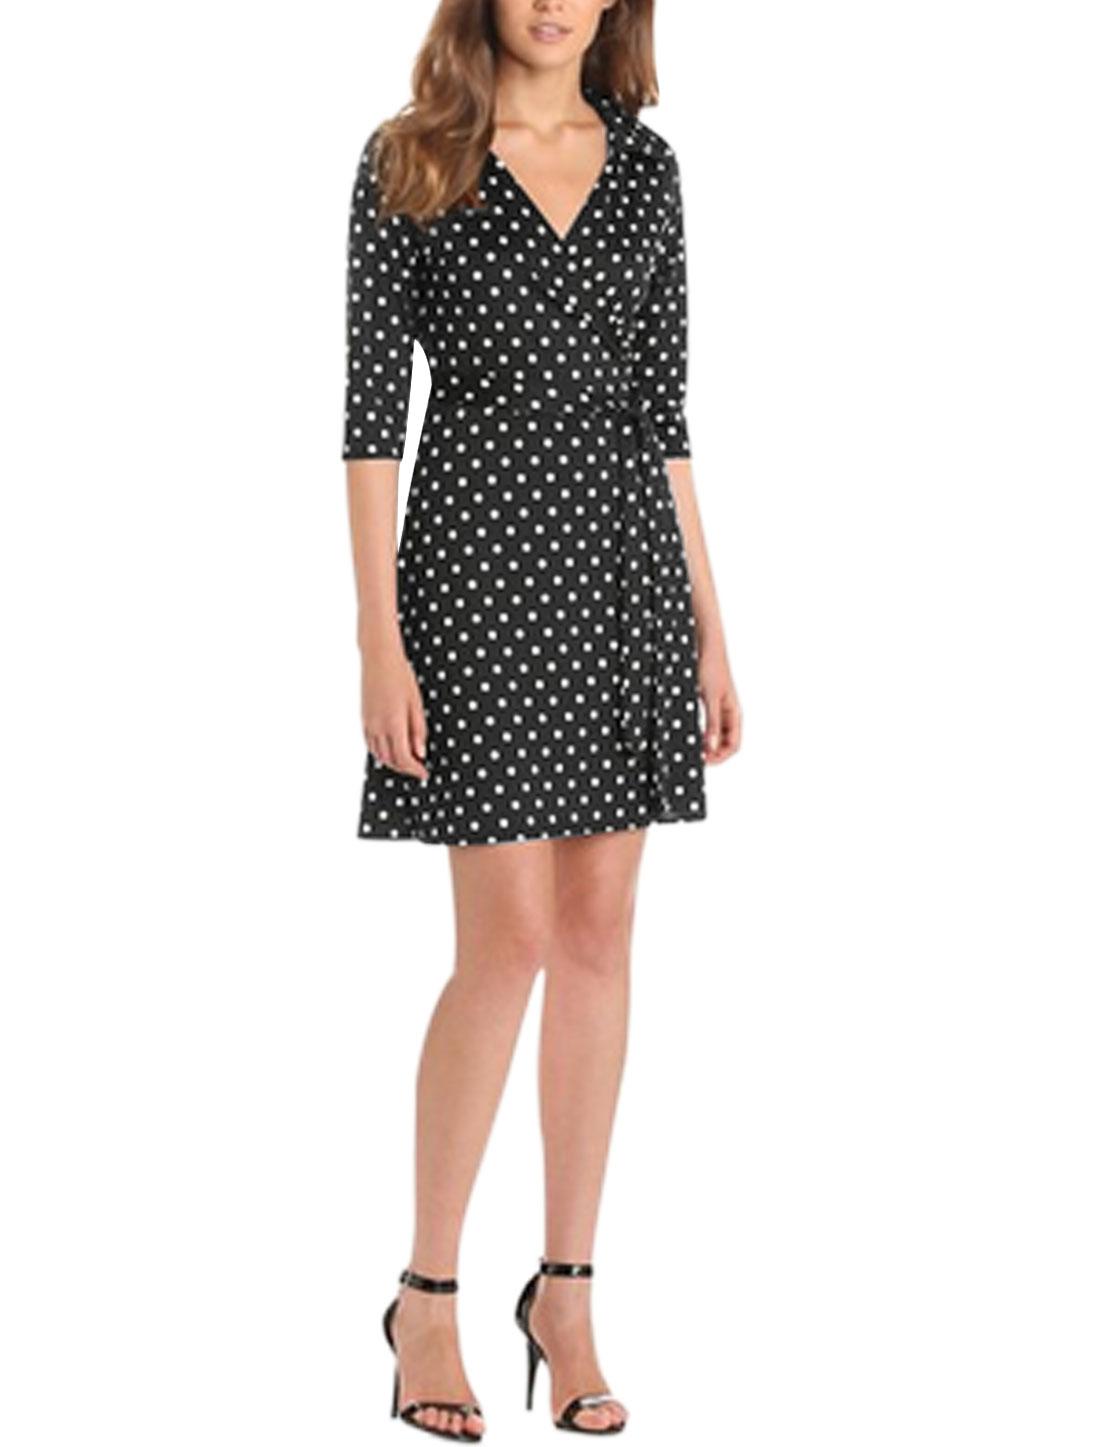 Women Crossover V Neck Dots Prints 3/4 Sleeves A Line Dress Black L